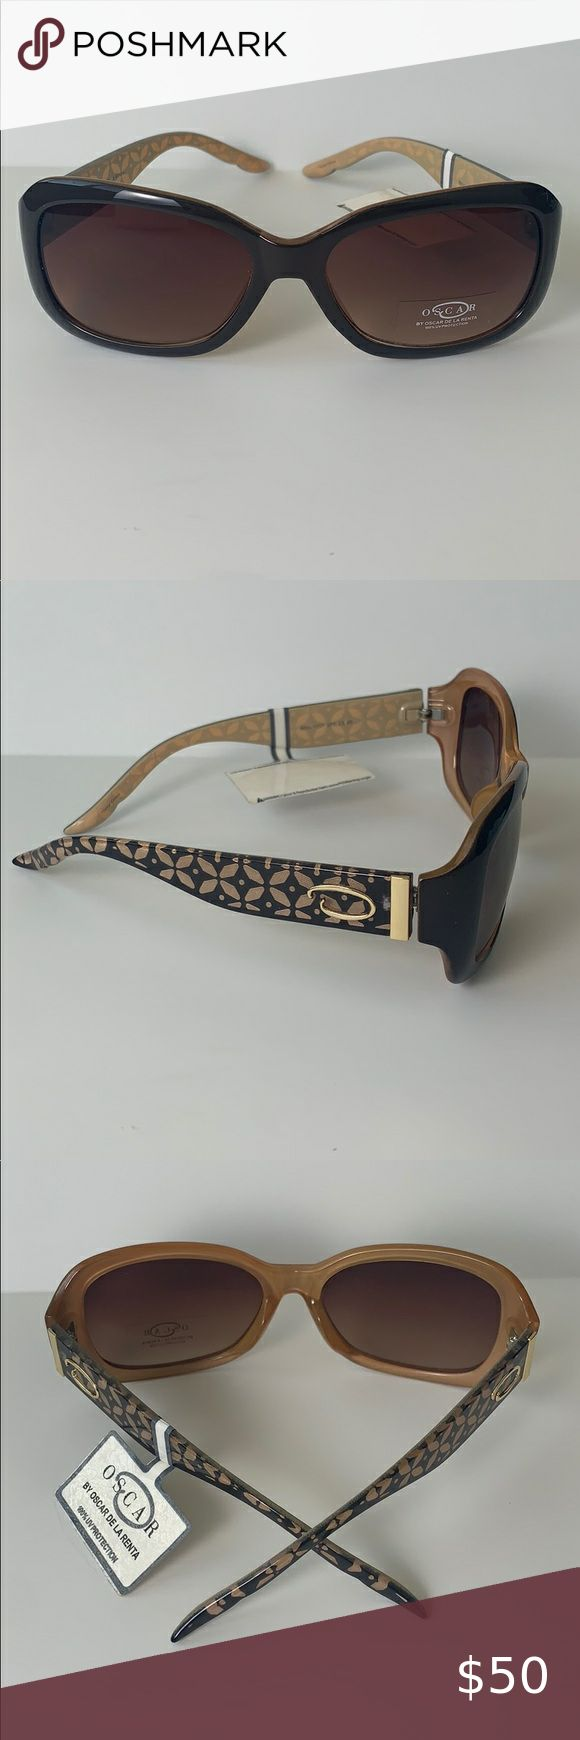 Oscar De La Renta Sunglasses Oscar De La Renta Sunglasses Accessories Women Accessories